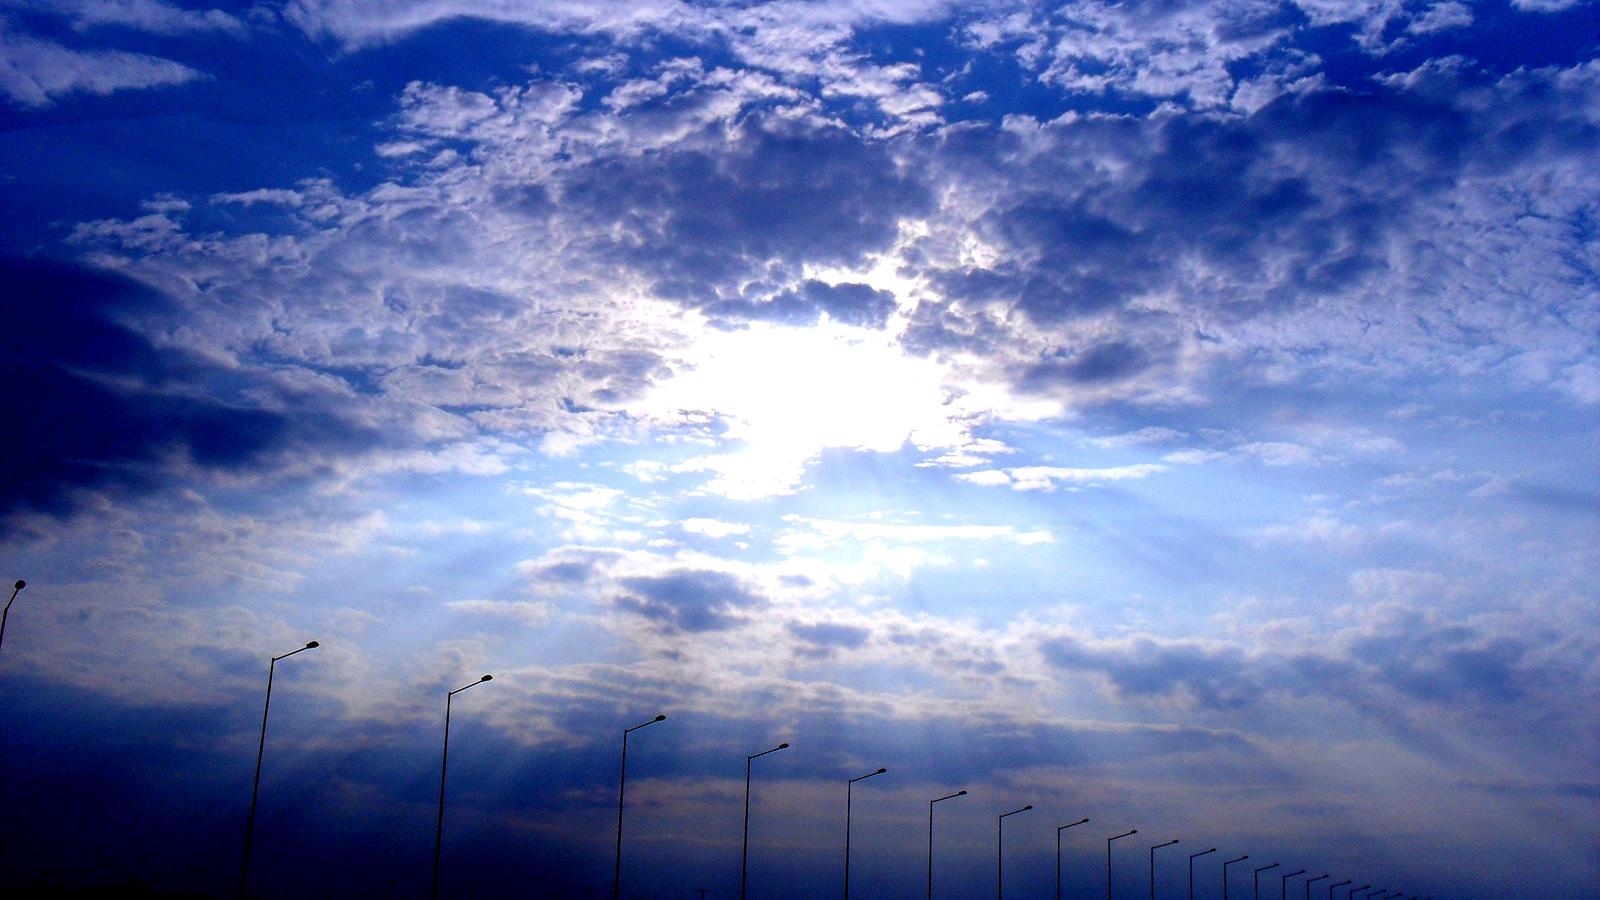 Heaven's gate - edit by varcolacu